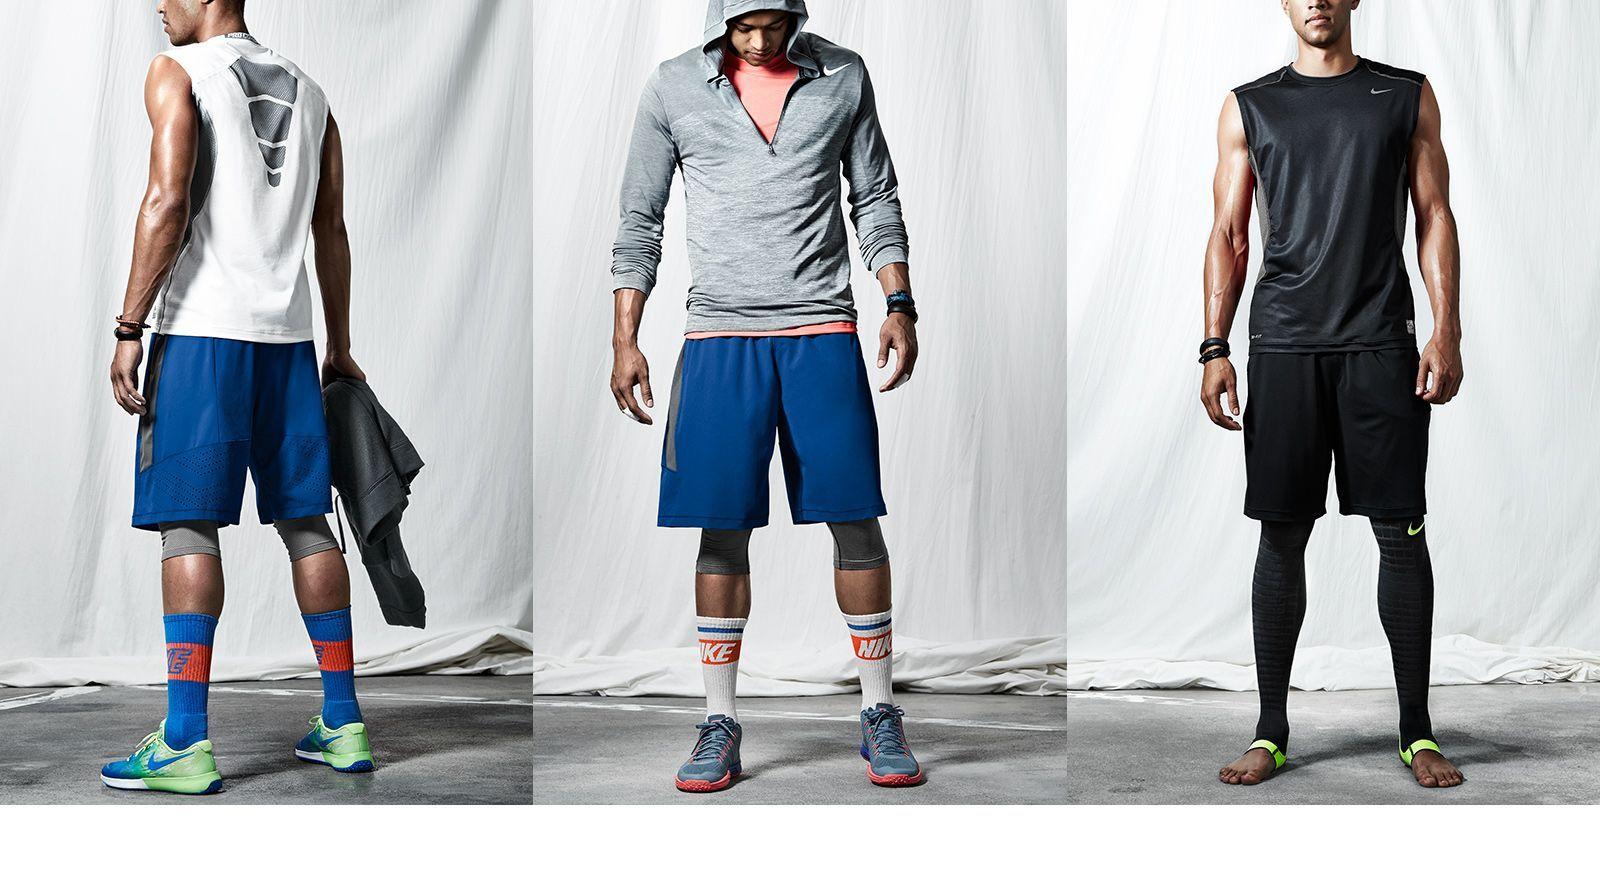 nike outfits men - Google Search